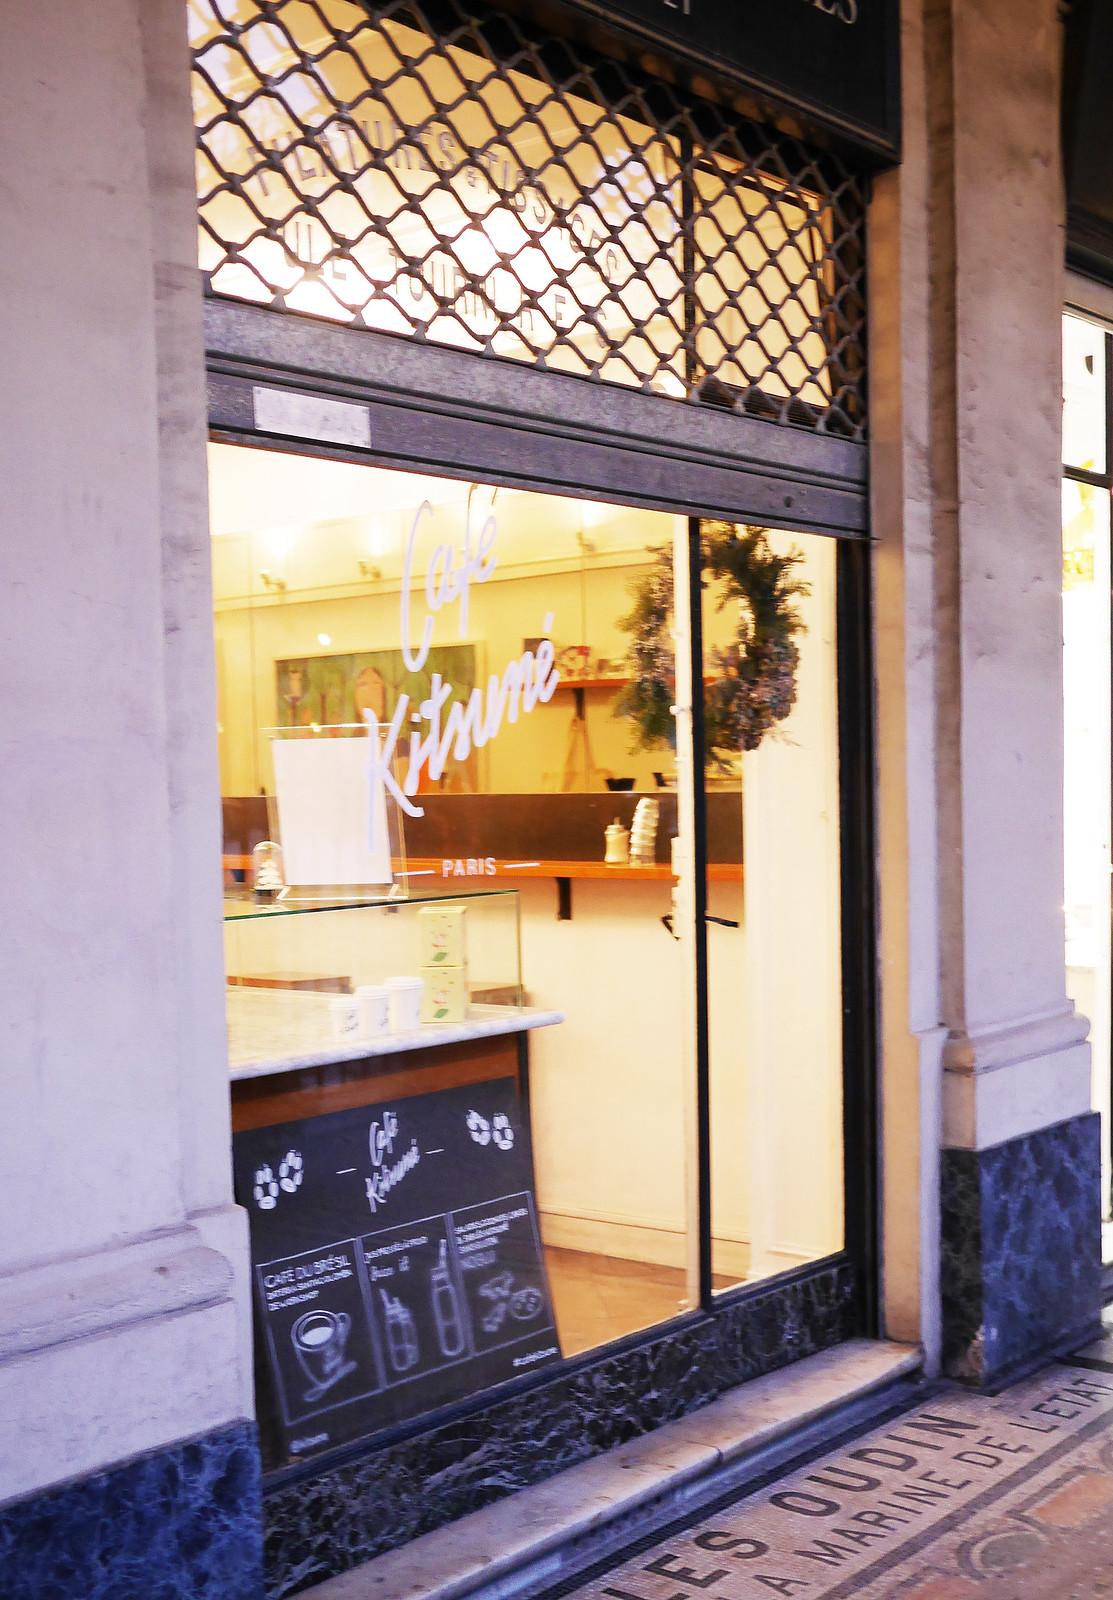 Café Kitsune Paris